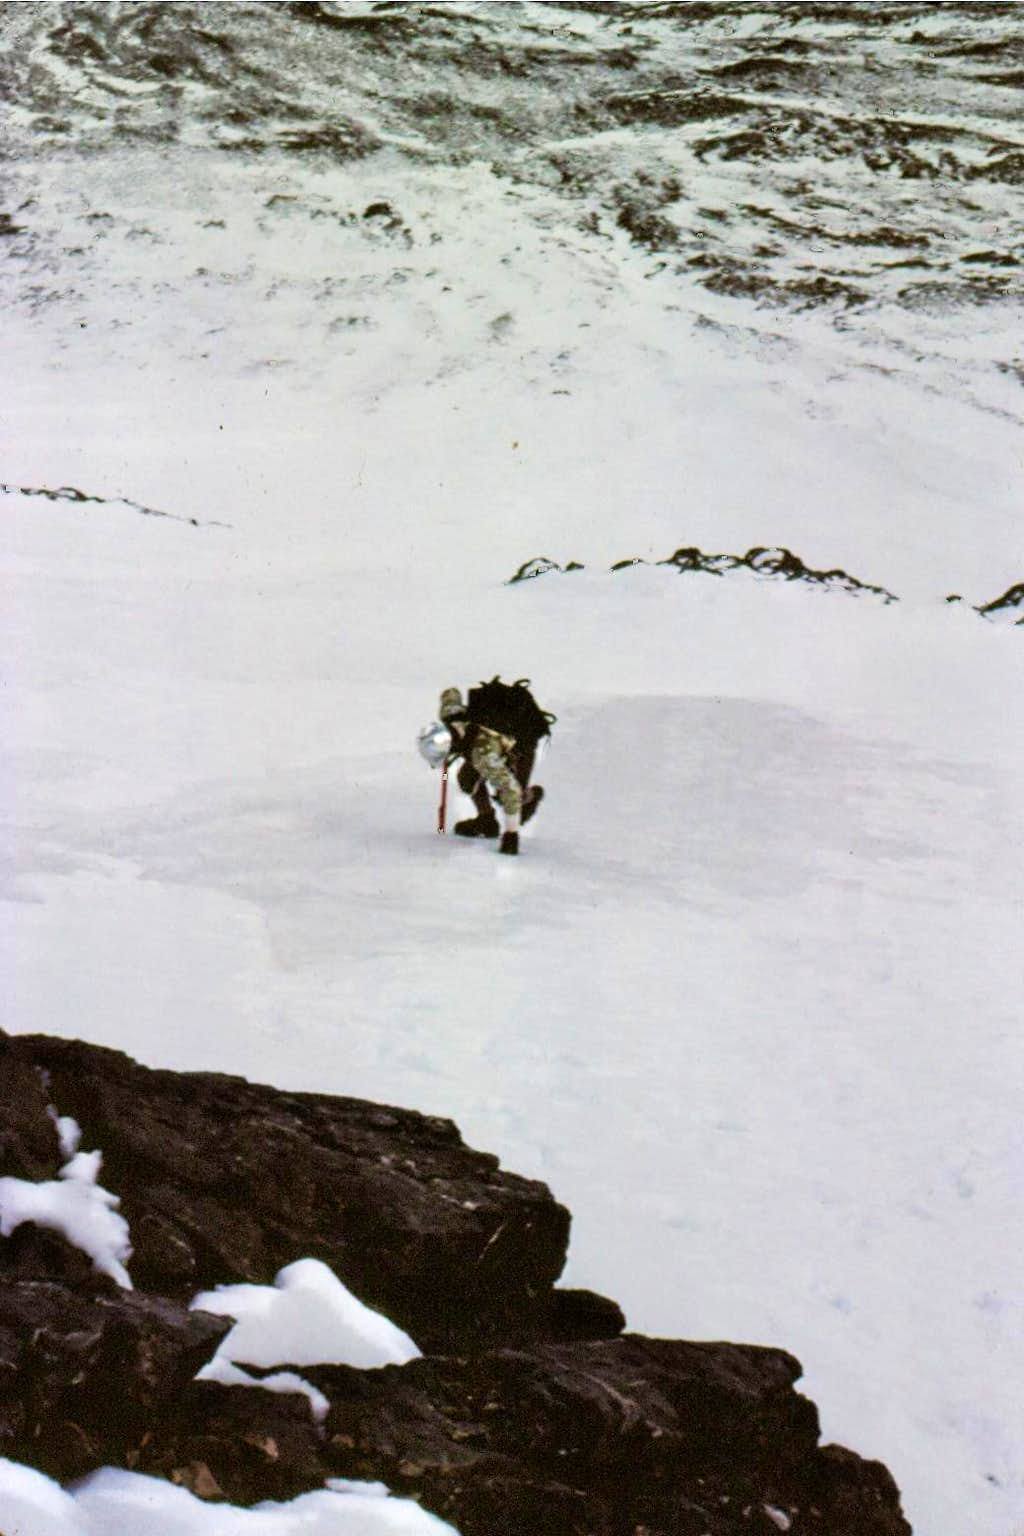 Lower North Face - Mt Borah